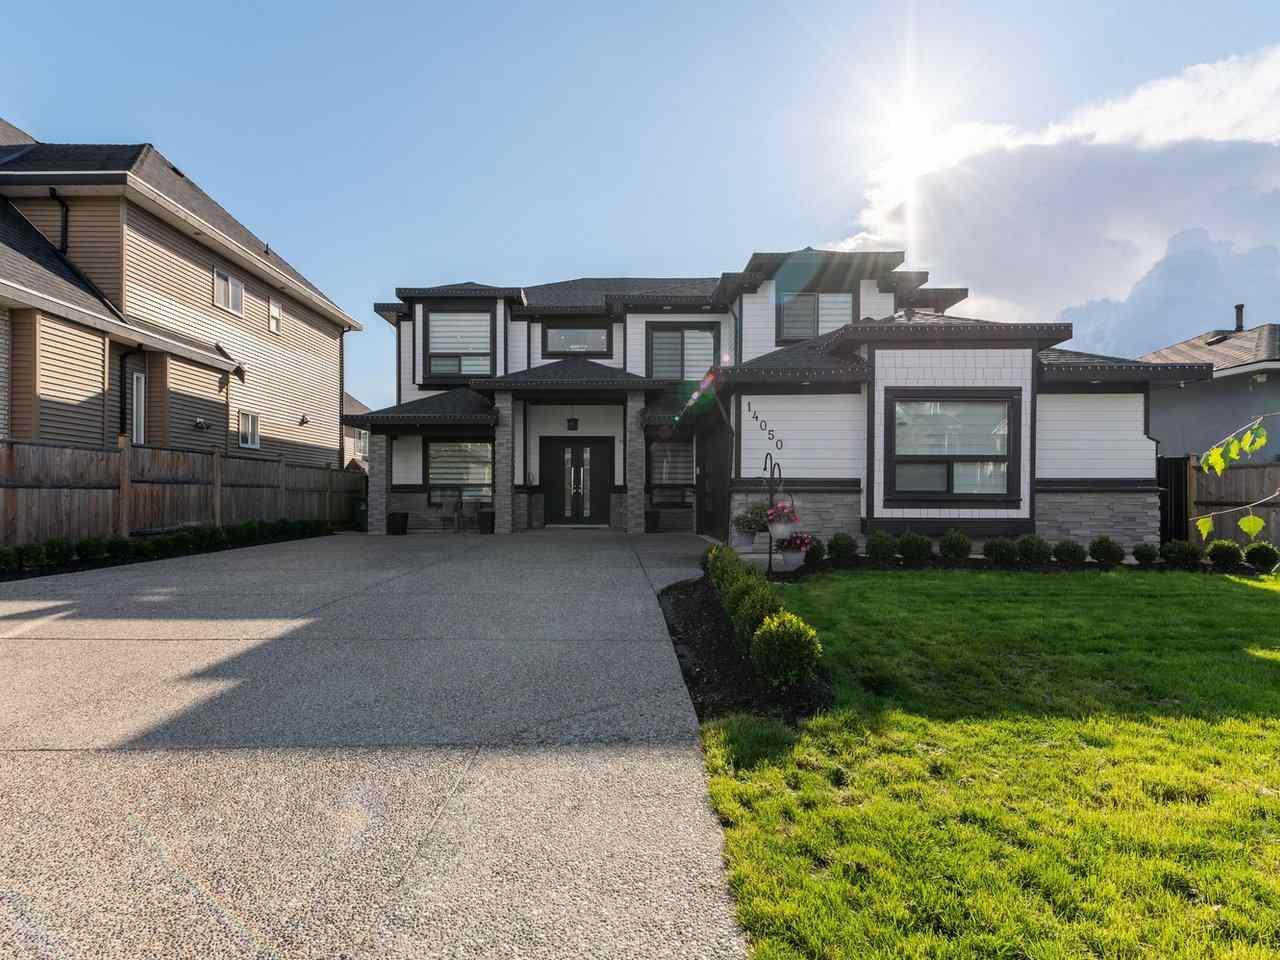 "Main Photo: 14050 91A Avenue in Surrey: Bear Creek Green Timbers House for sale in ""Bear Creek Green Timber"" : MLS®# R2511466"